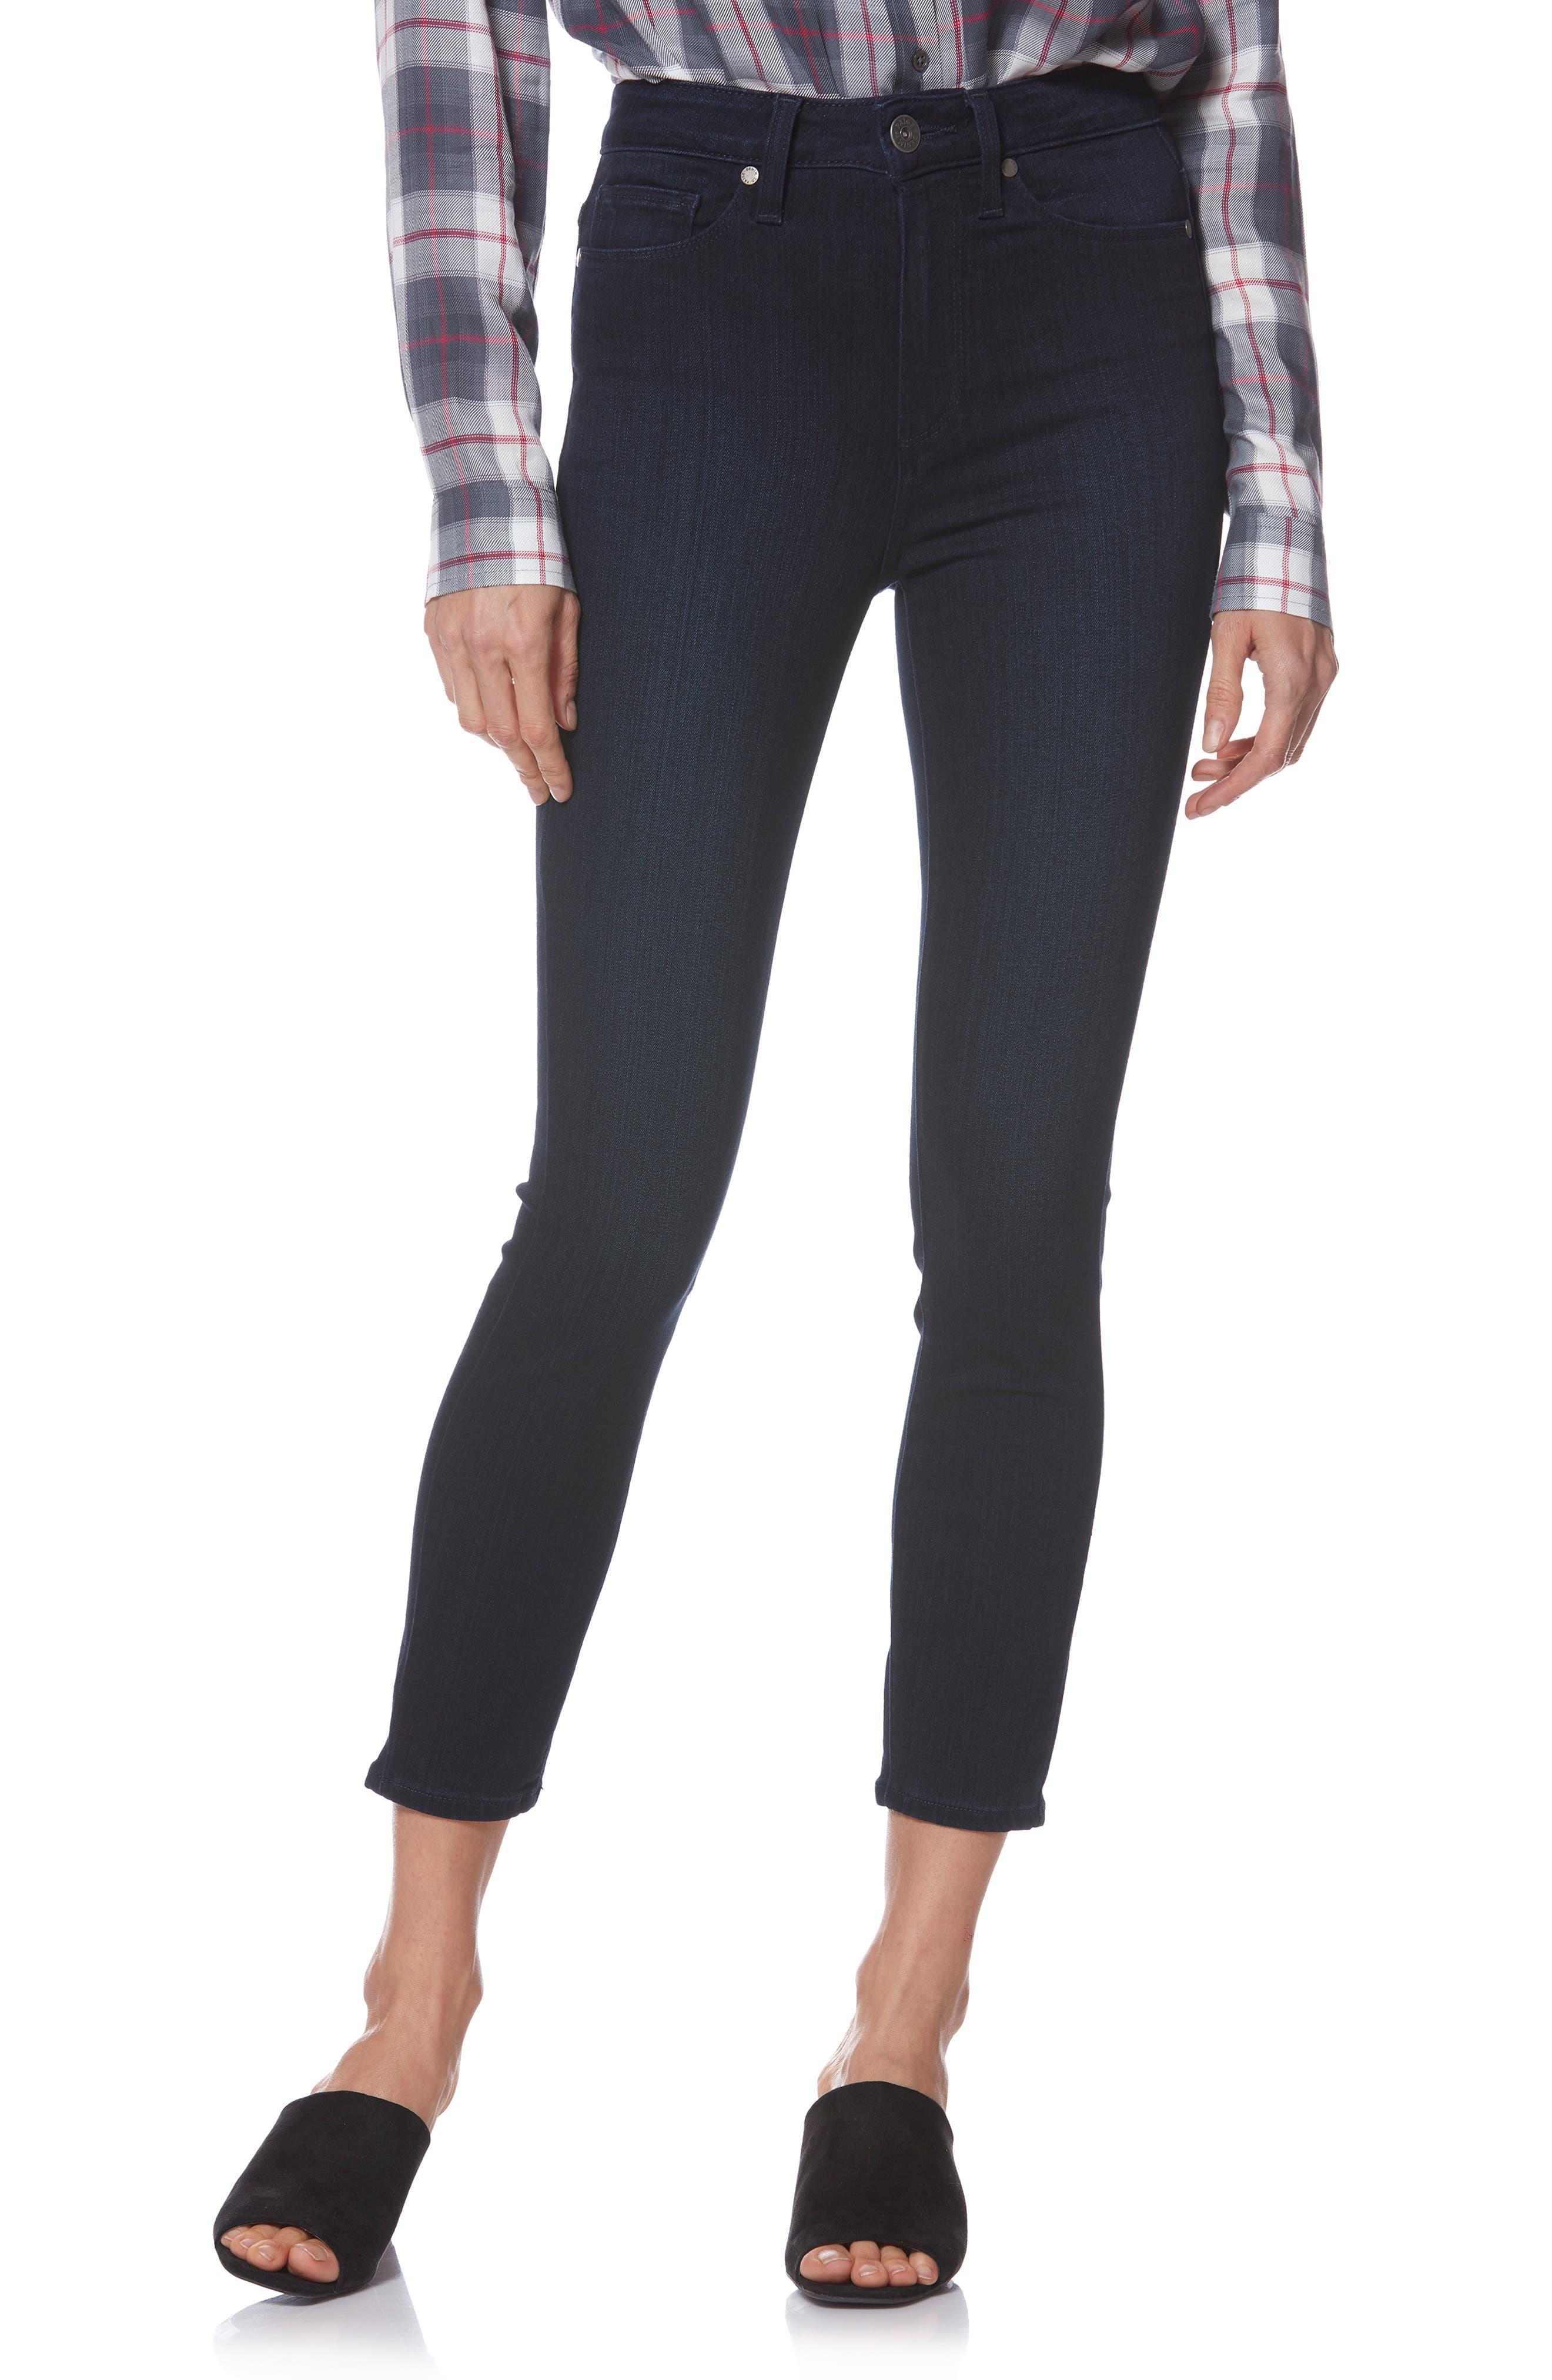 Transcend - Margot High Waist Crop Skinny Jeans,                             Main thumbnail 1, color,                             LANA